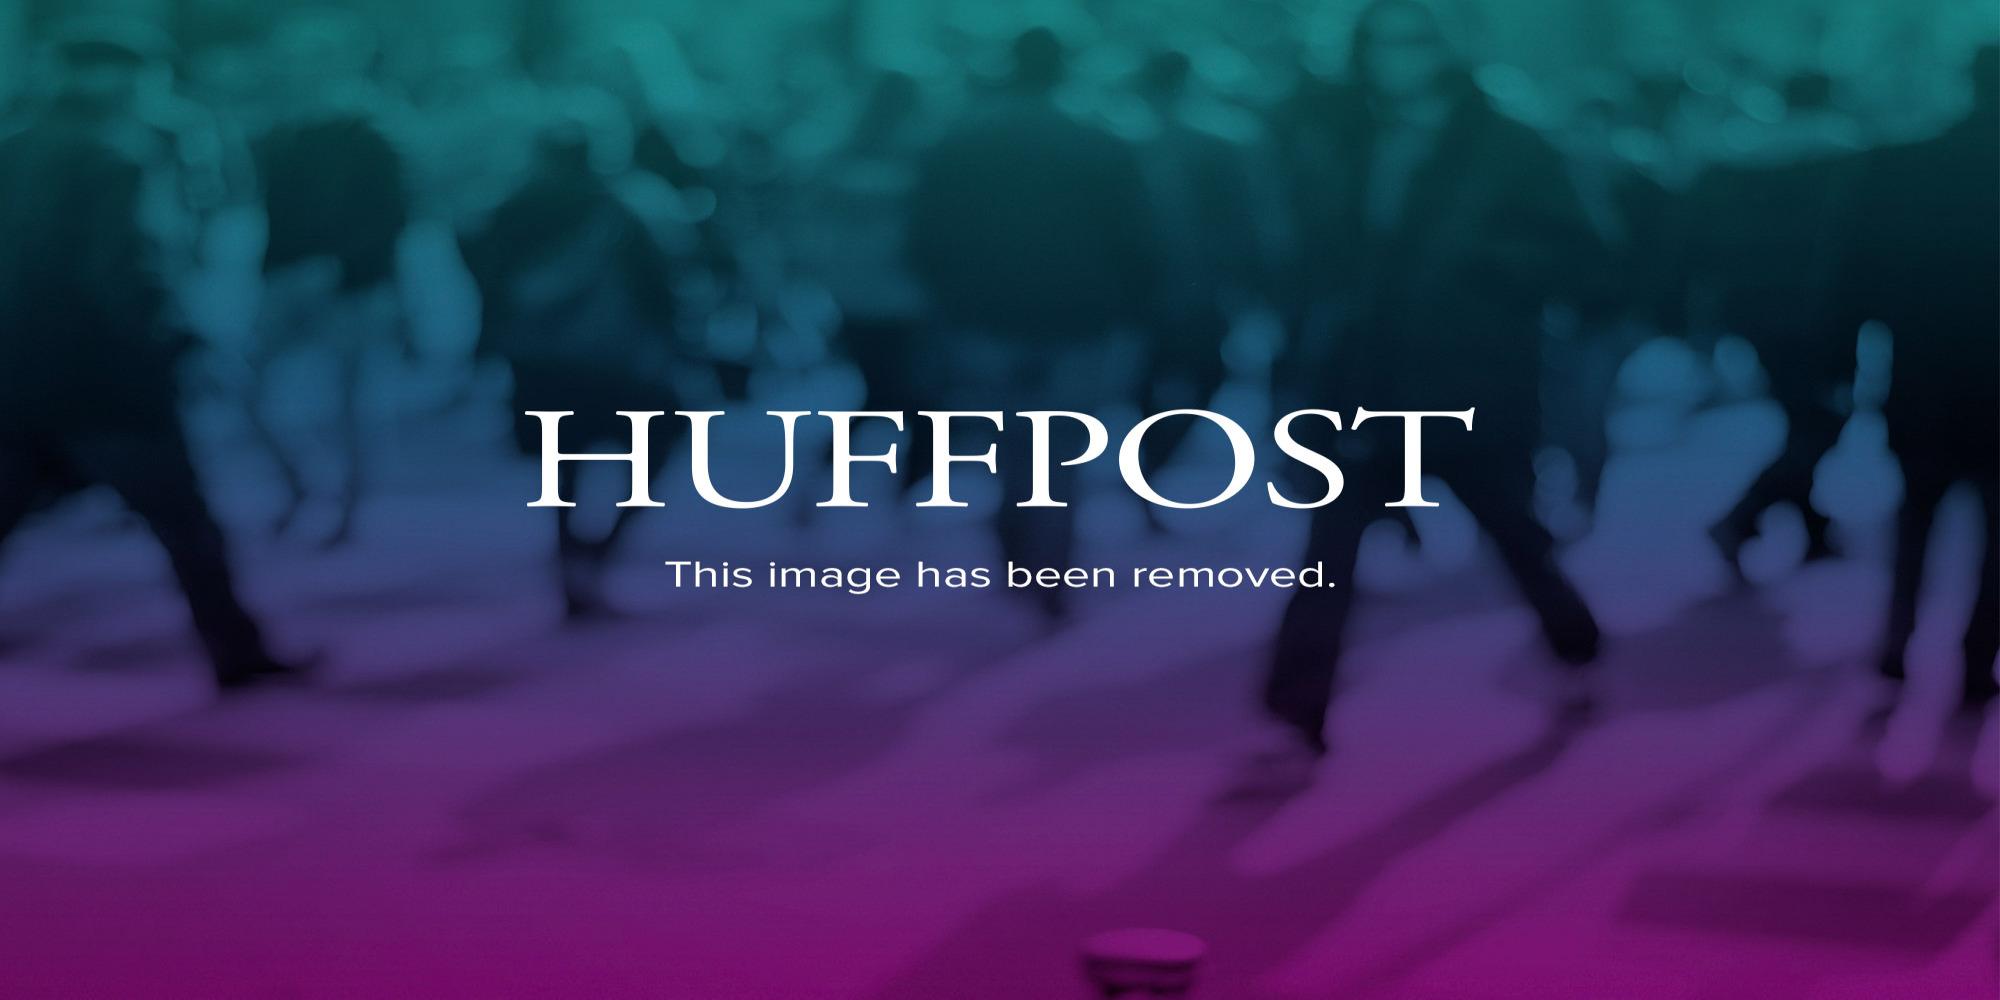 http://www.huffingtonpost.com/2013/12/05/homewrecker-fantasia-barrino-cheating-ex-estranged-wife_n_4393271.html